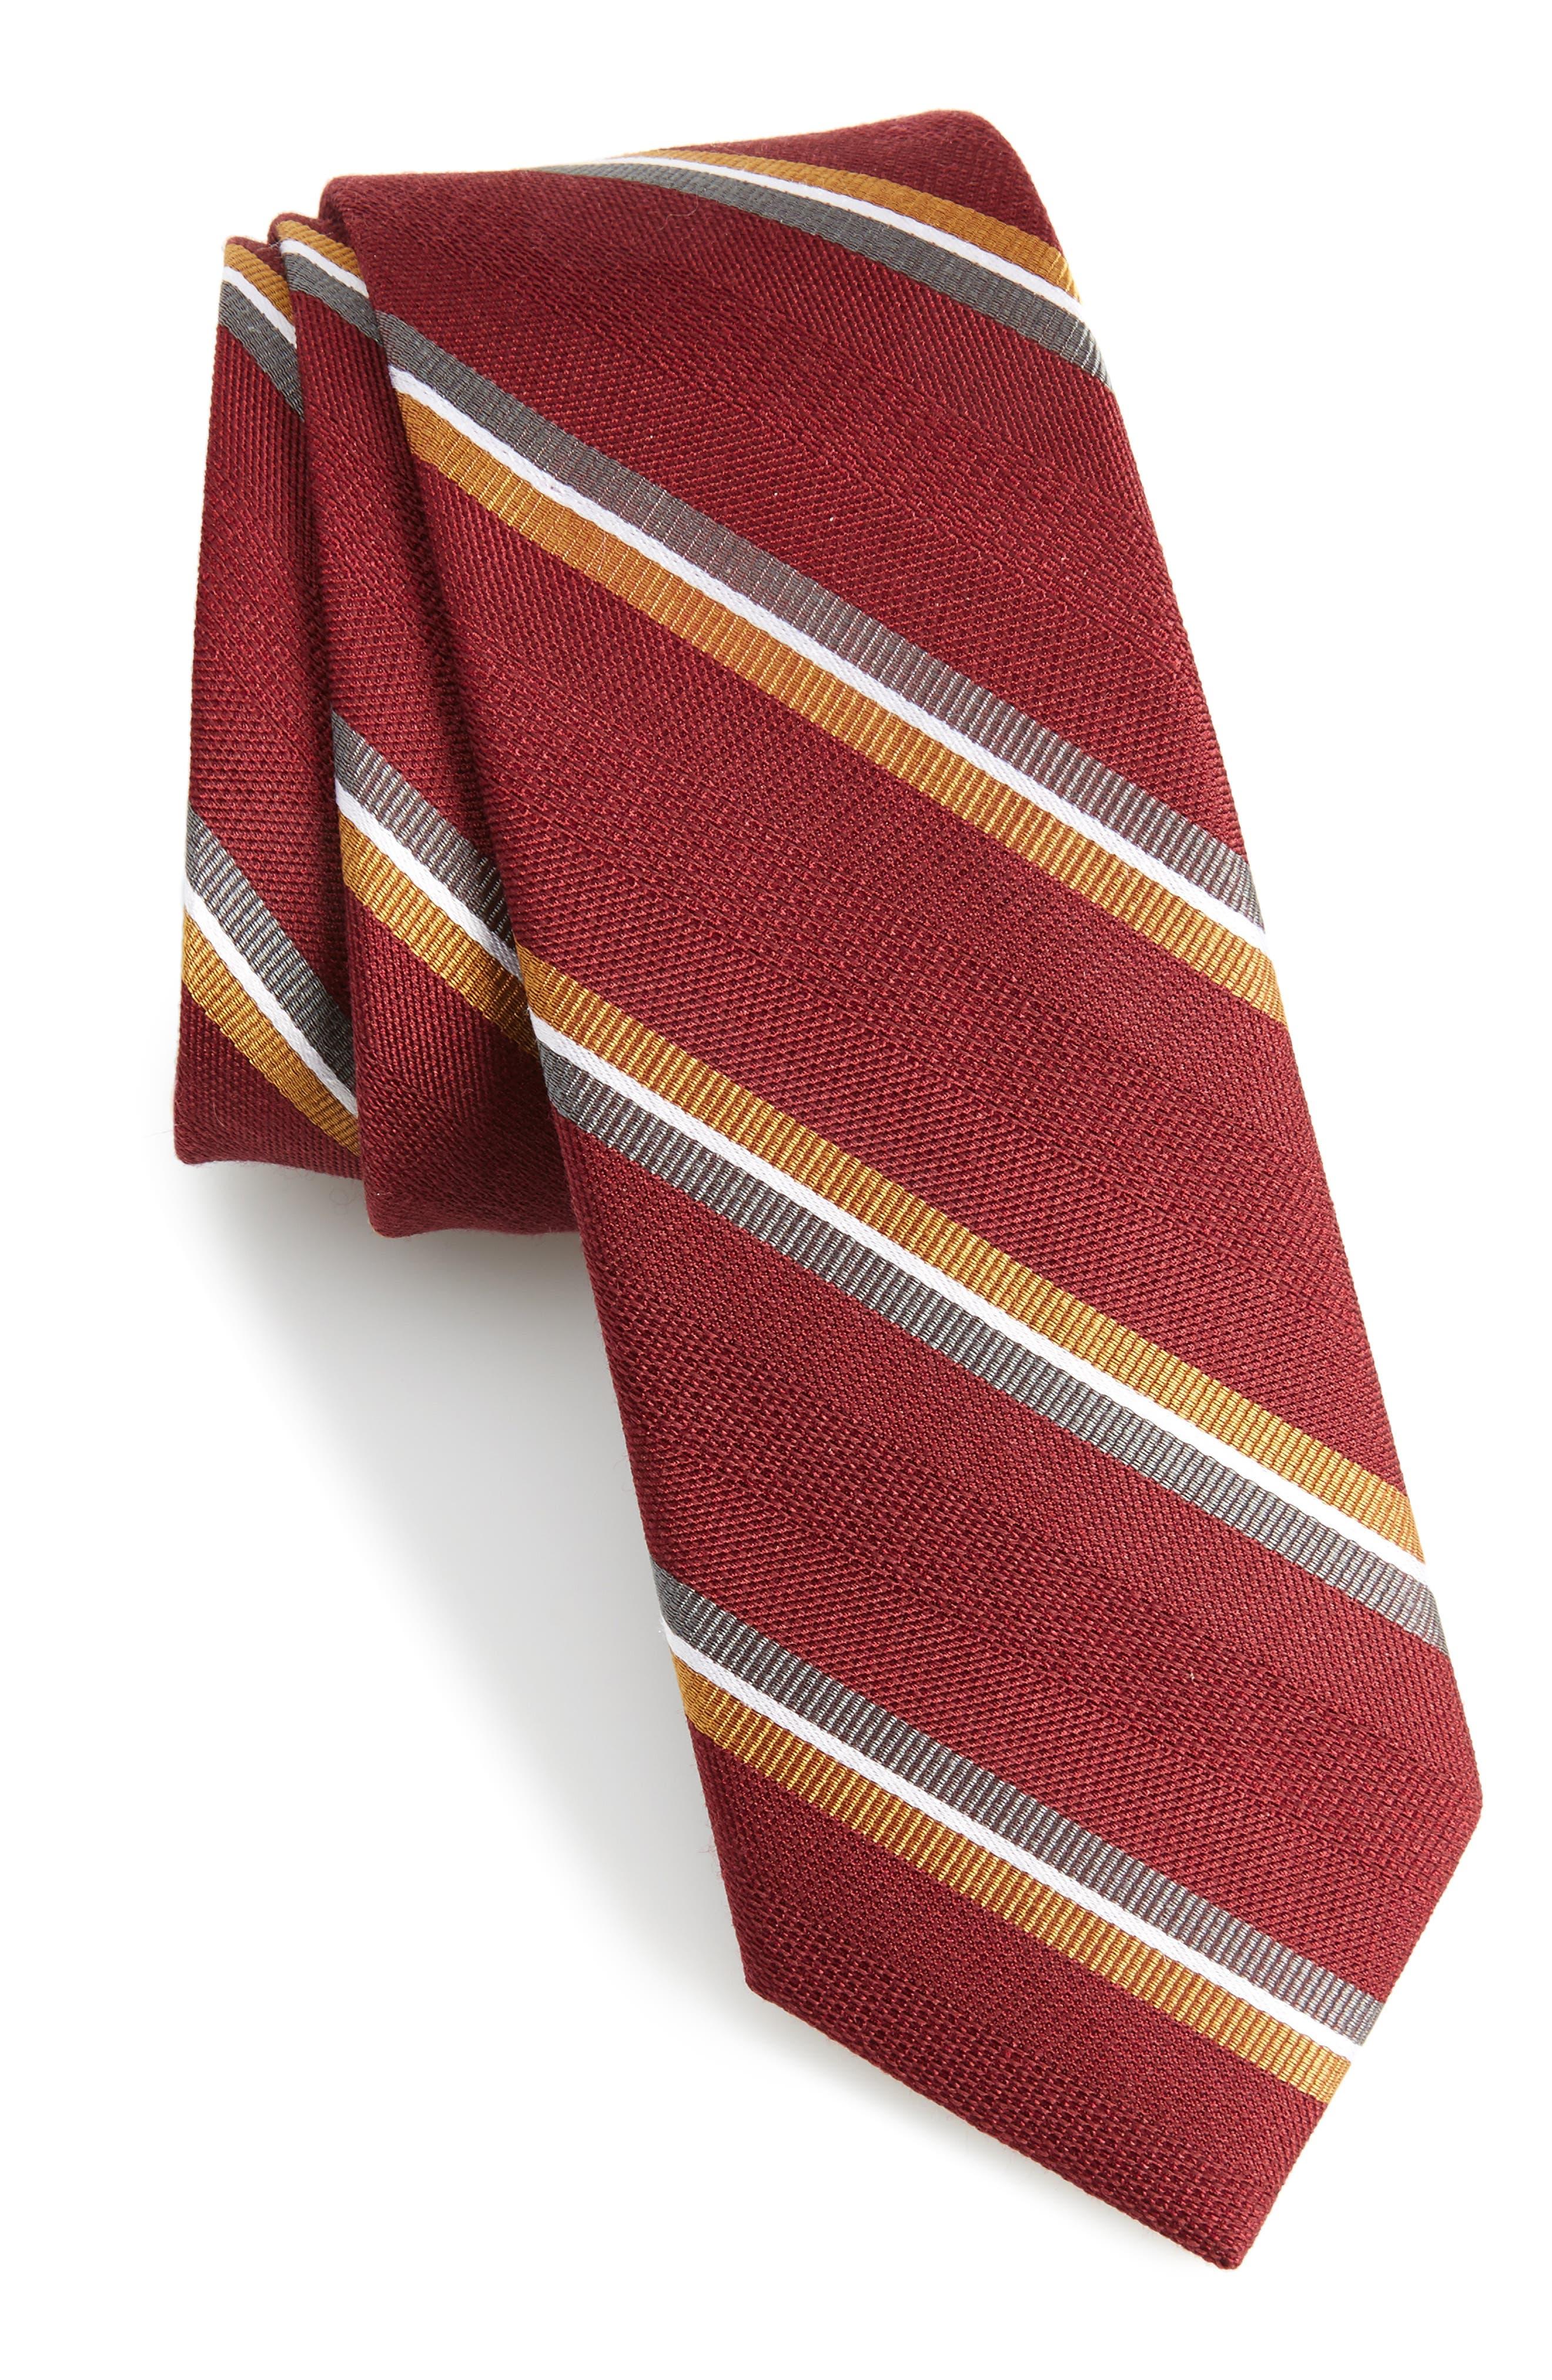 Main Image - The Tie Bar Short Cut Stripe Silk & Wool Skinny Tie